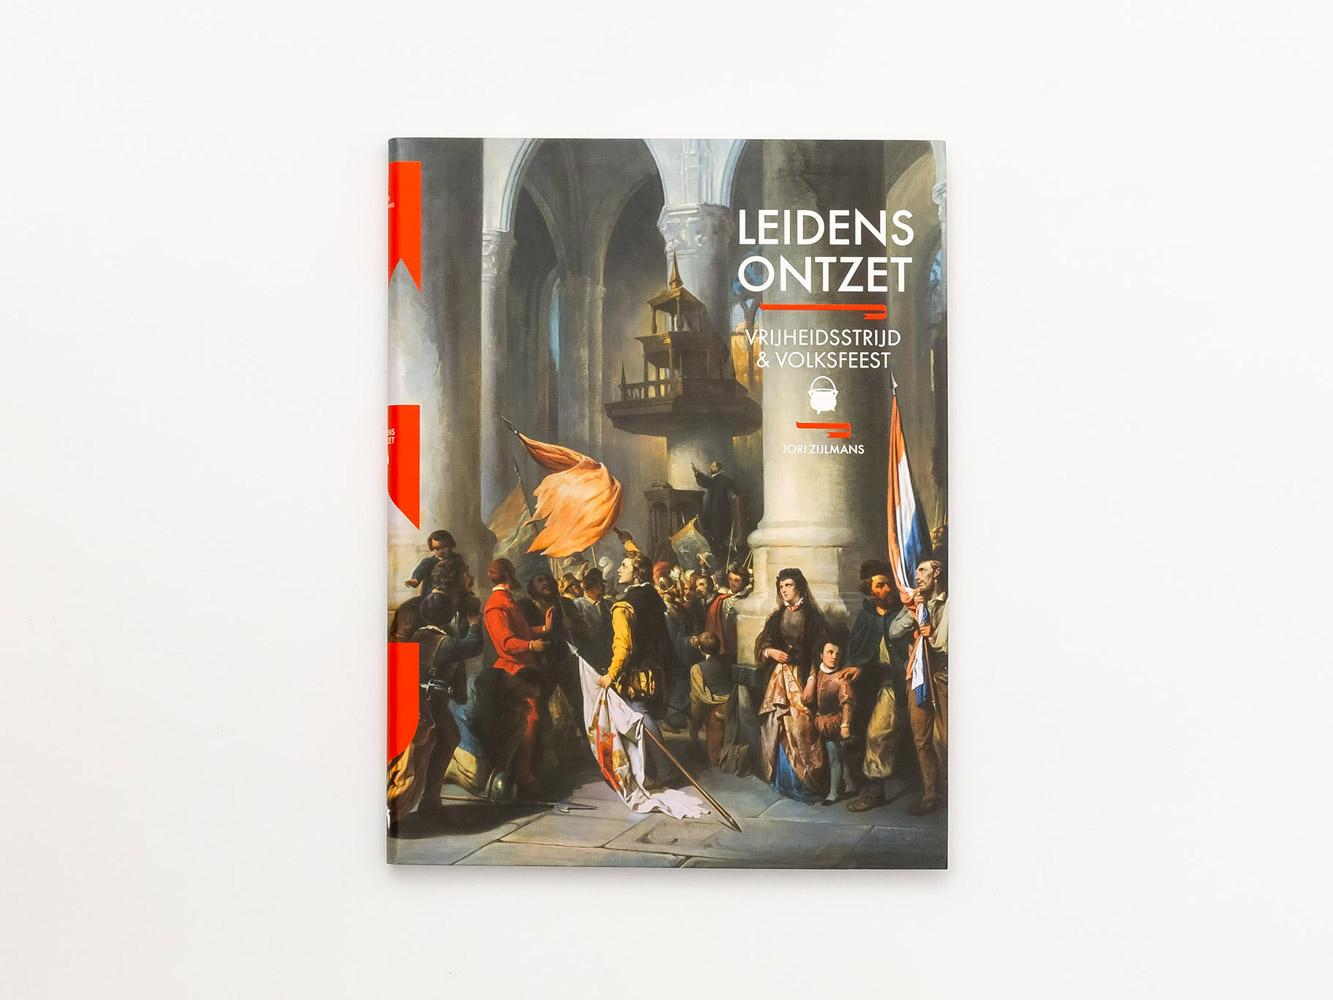 museum de lakenhal leidens ontzet publicatie nr 1 2 jpg